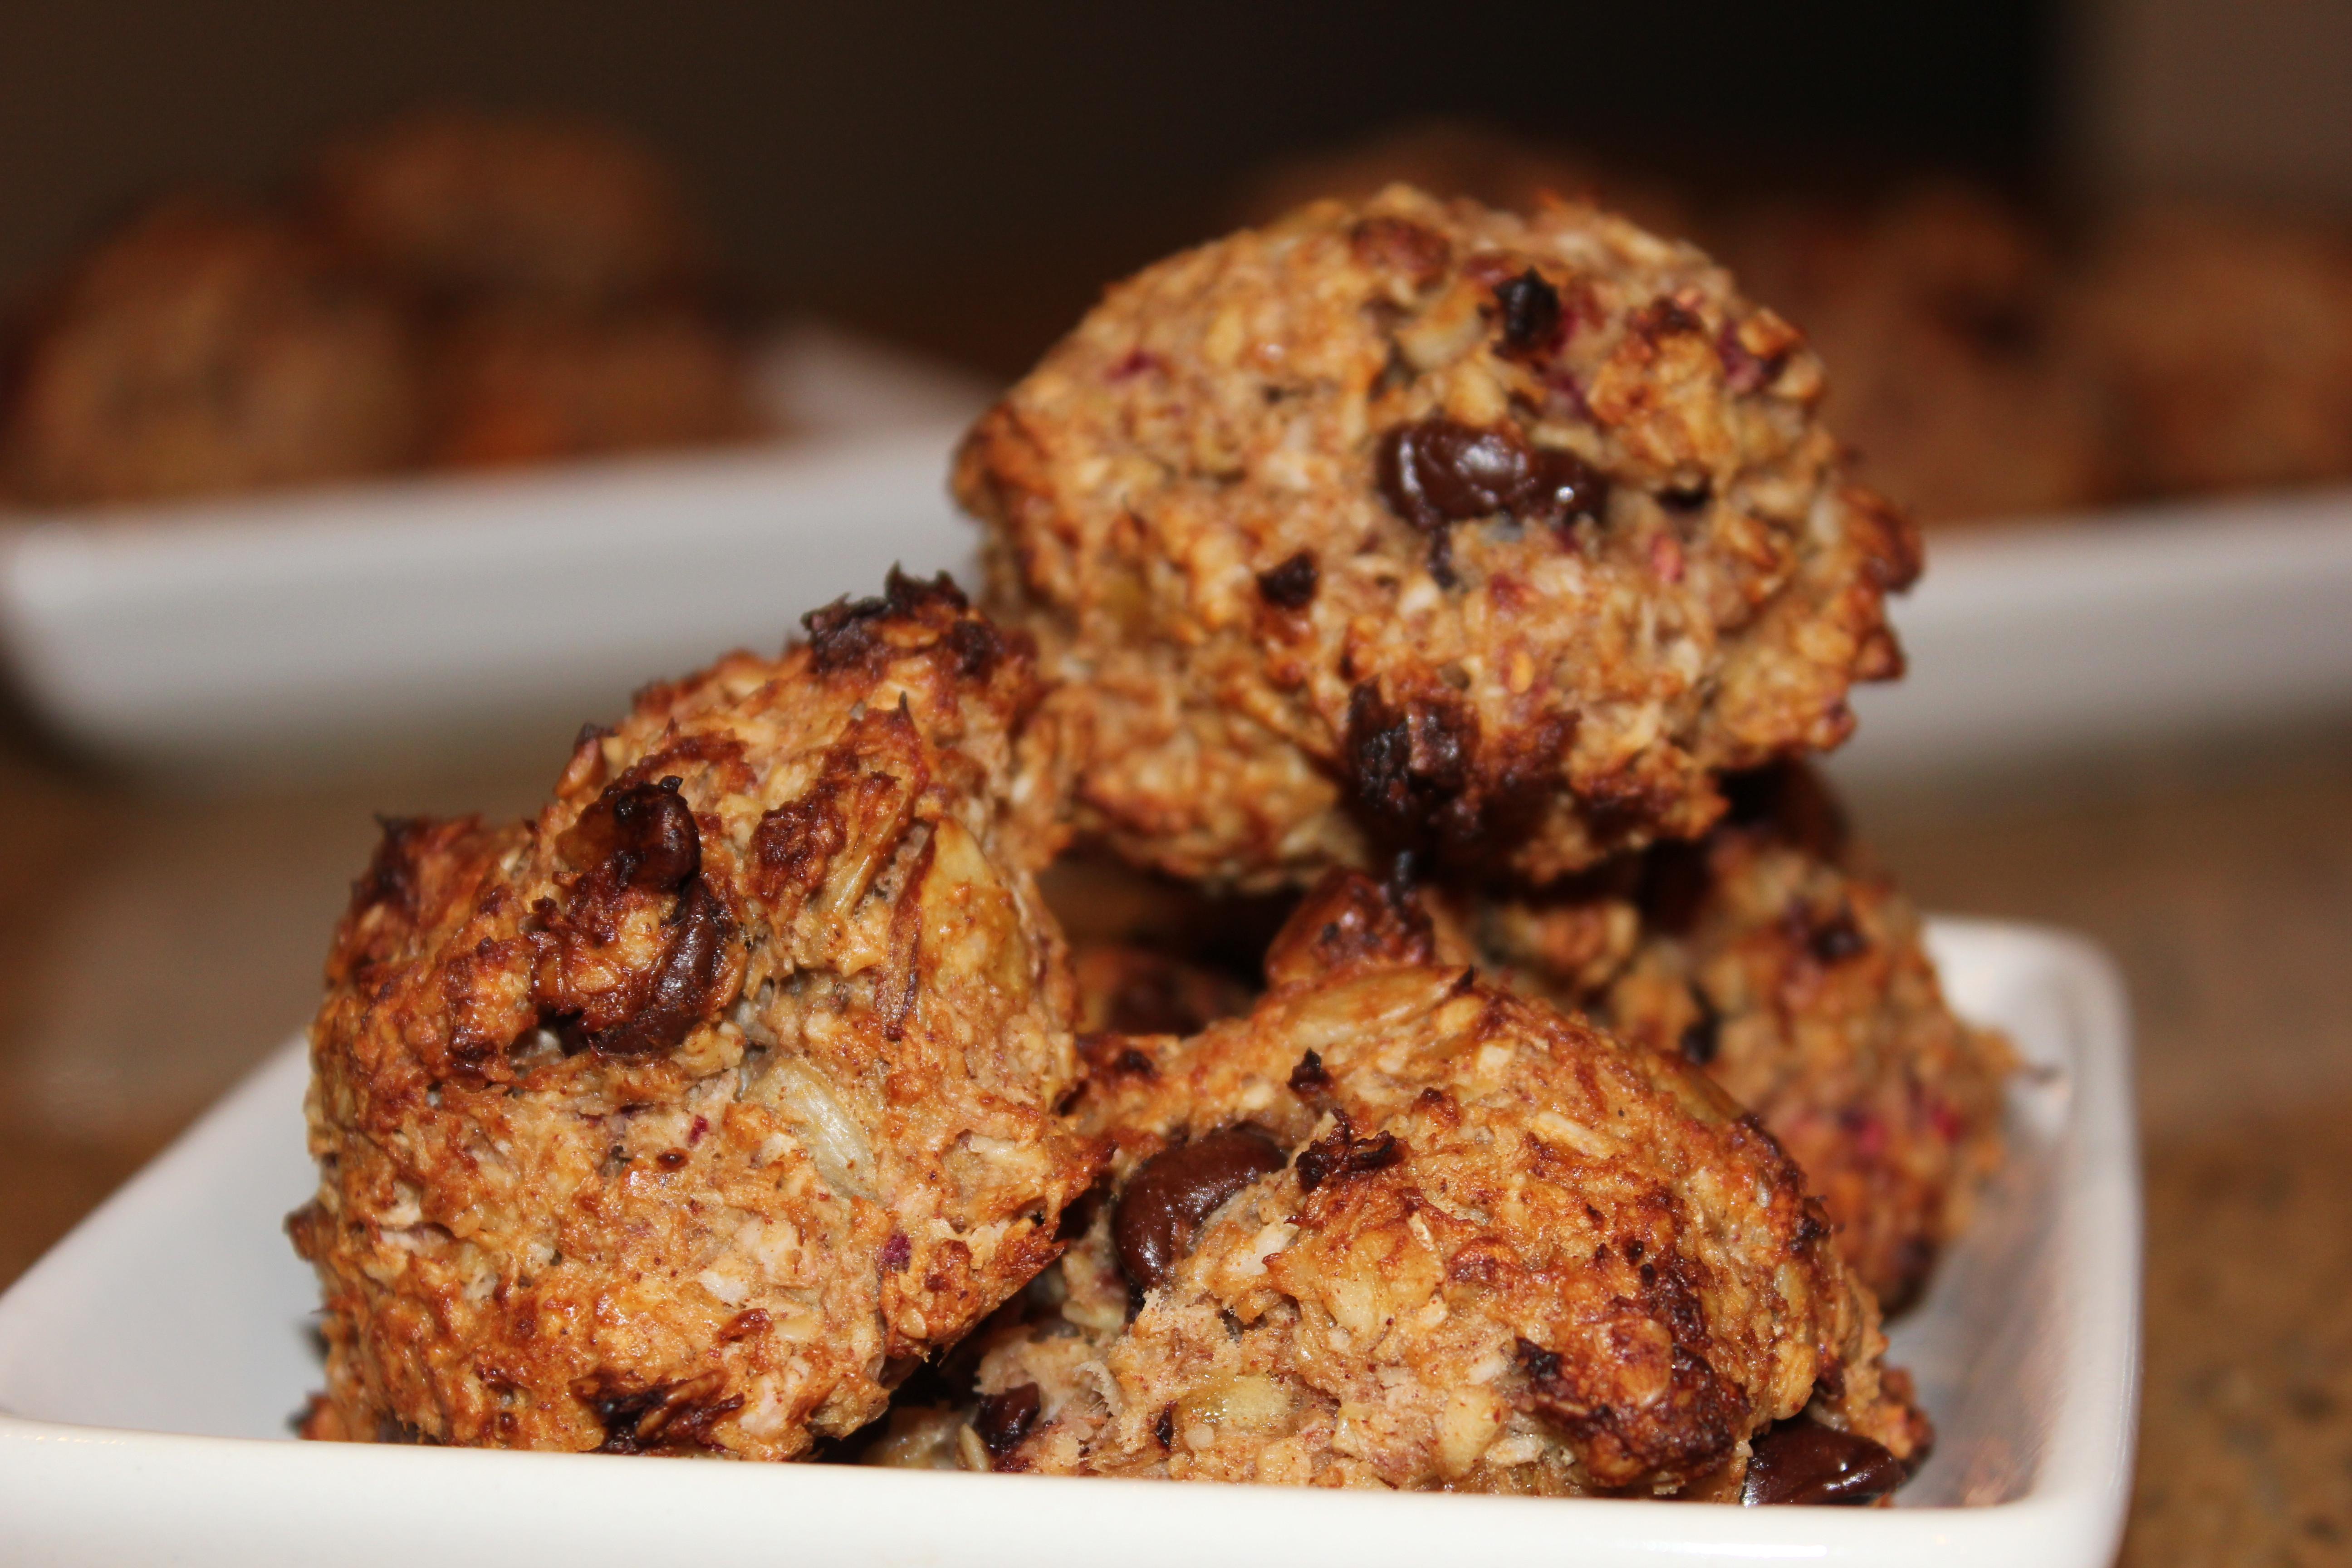 Healthy Gluten Free Cookie Recipes  Healthy Recipes For Gluten Free Cookies